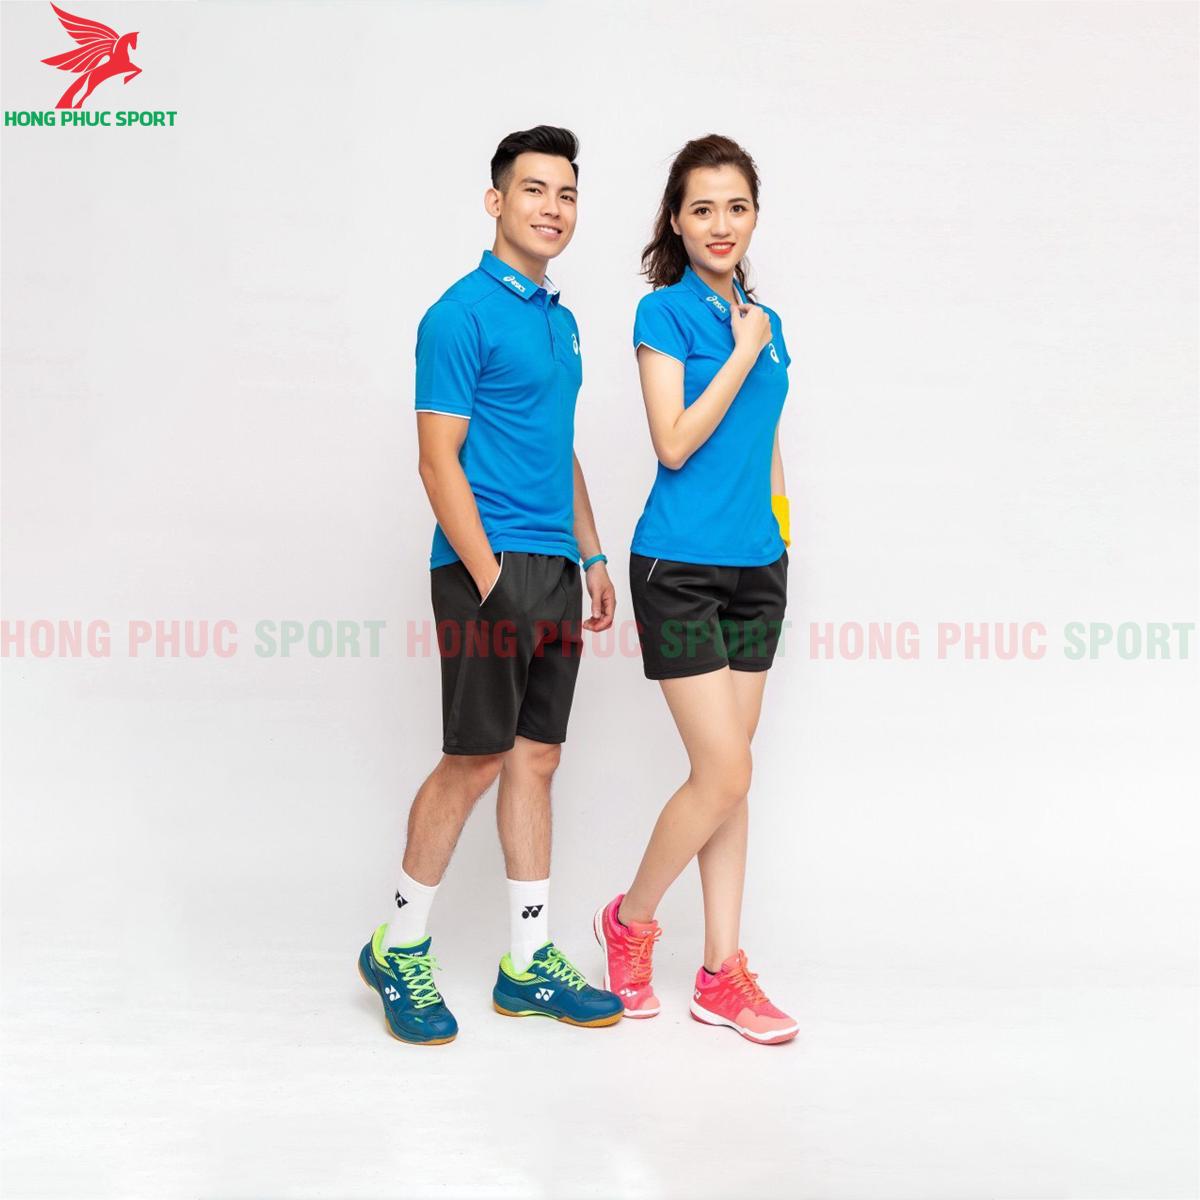 https://cdn.hongphucsport.com/unsafe/s4.shopbay.vn/files/285/ao-tennis-asic-2020-mau-xanh-duong-5f76ef94d9449.png